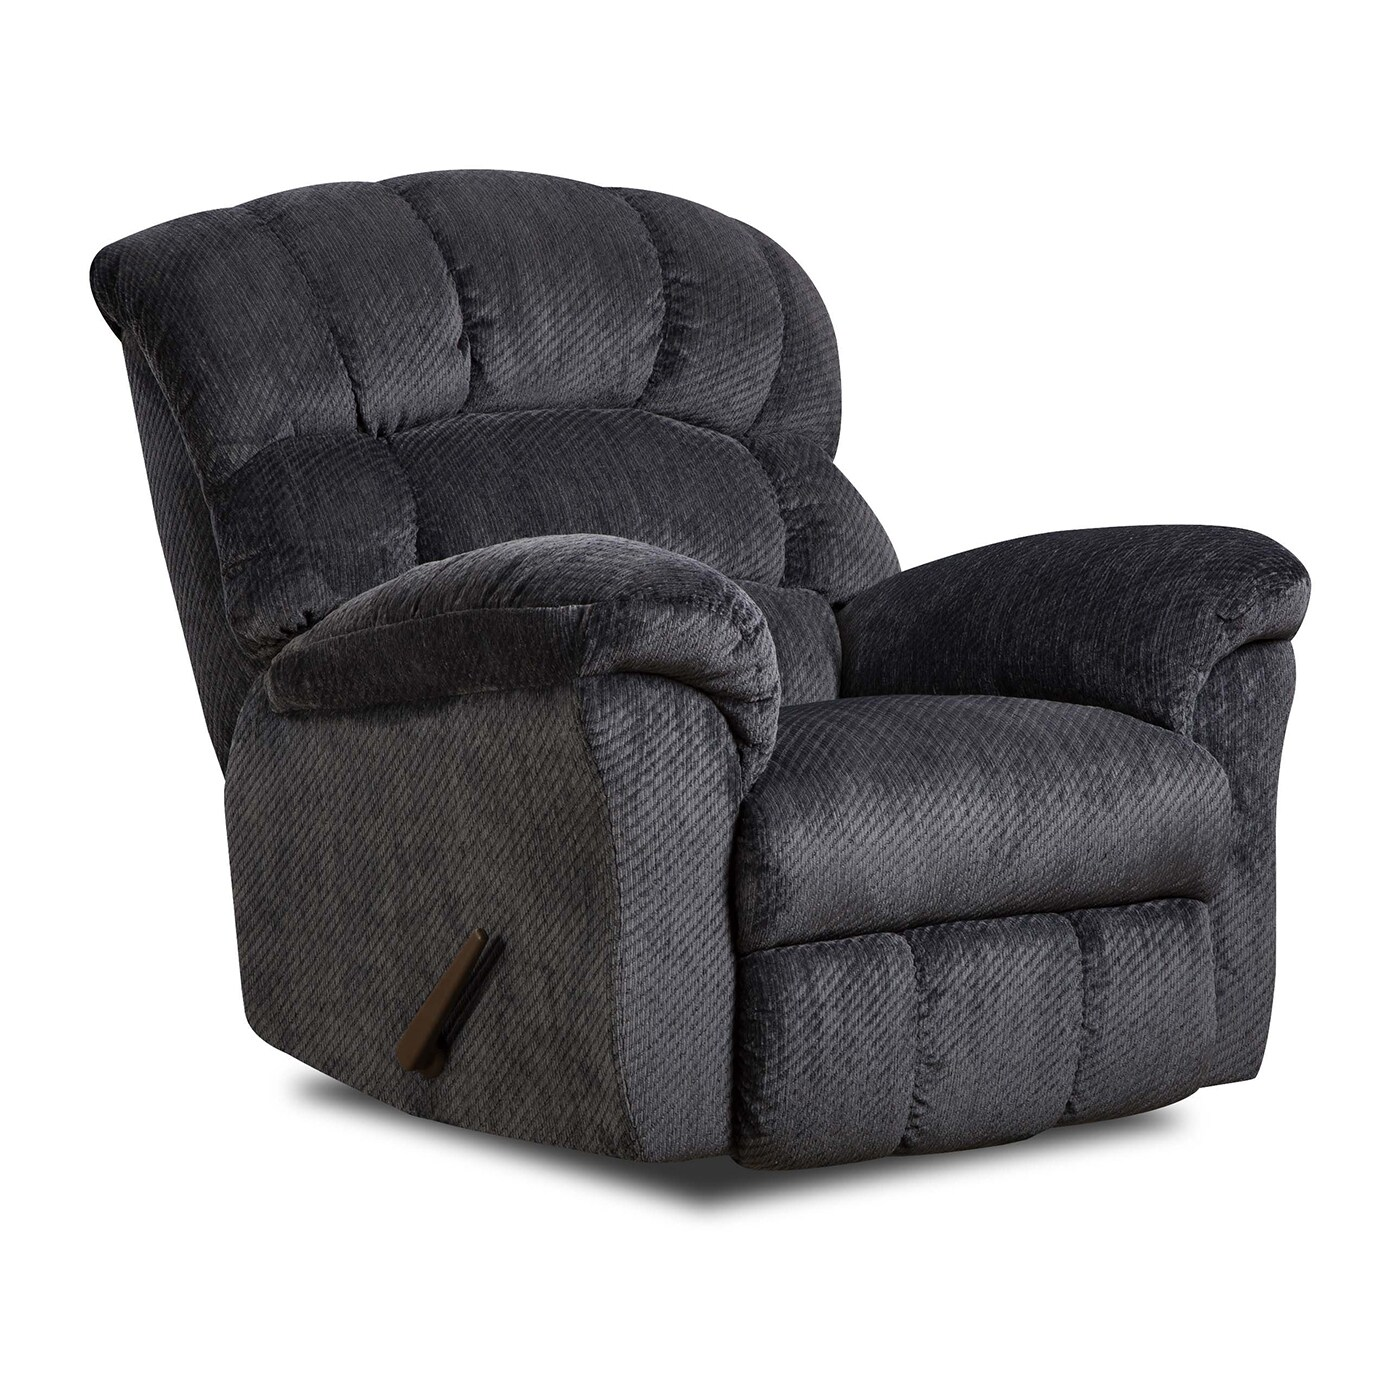 simmons rocker recliner. simmons upholstery victor rocker recliner (navy), blue, s.. s